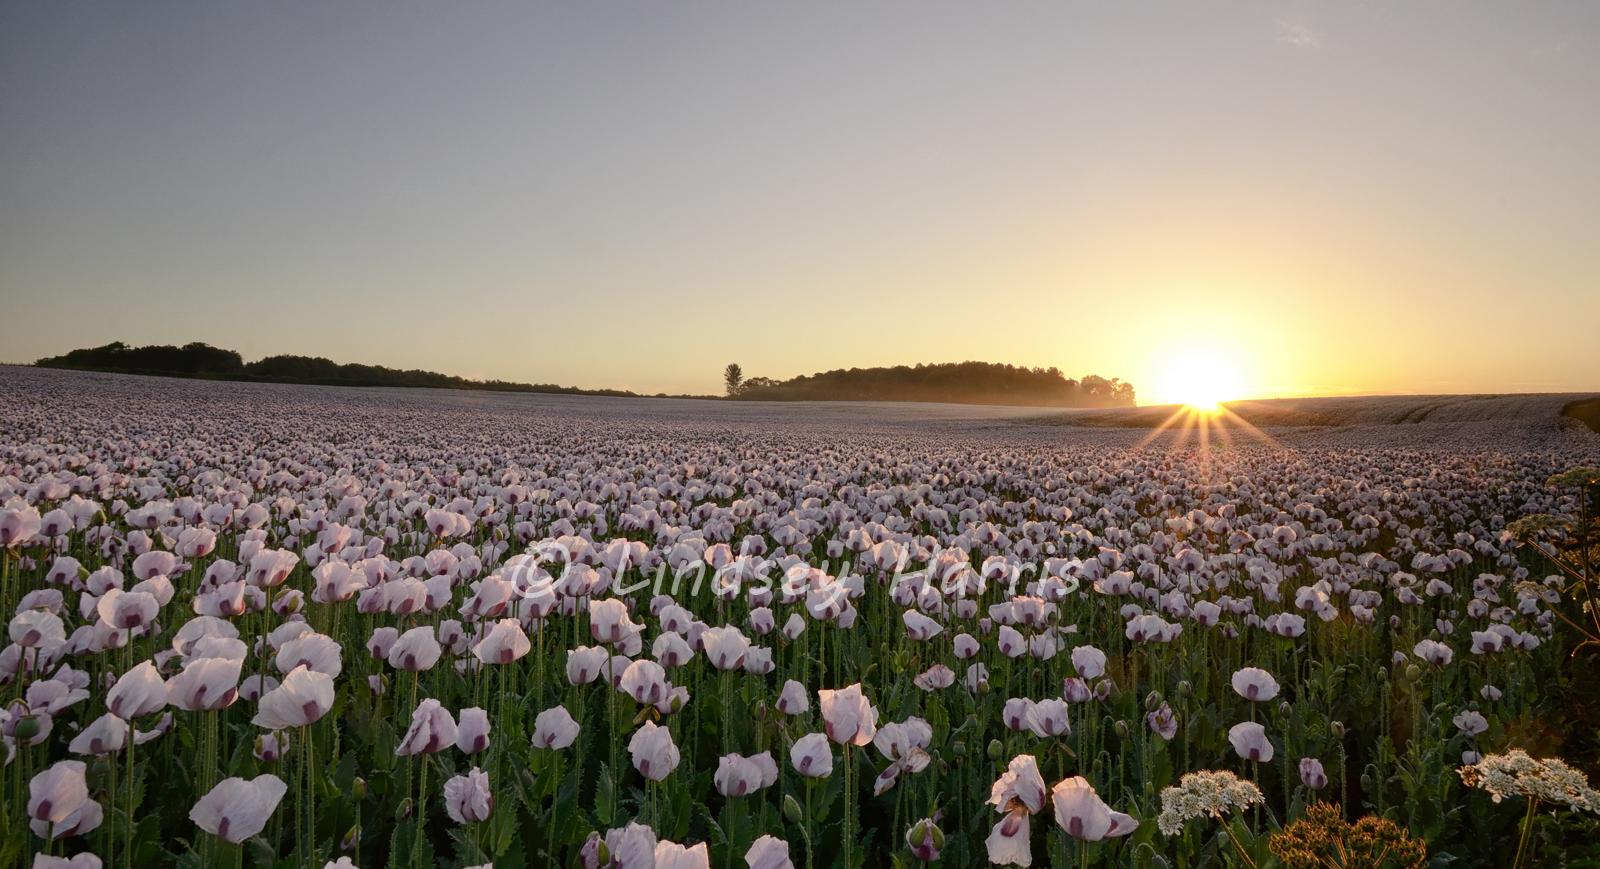 Poppy fields at sunrise. Photo of opium poppies.